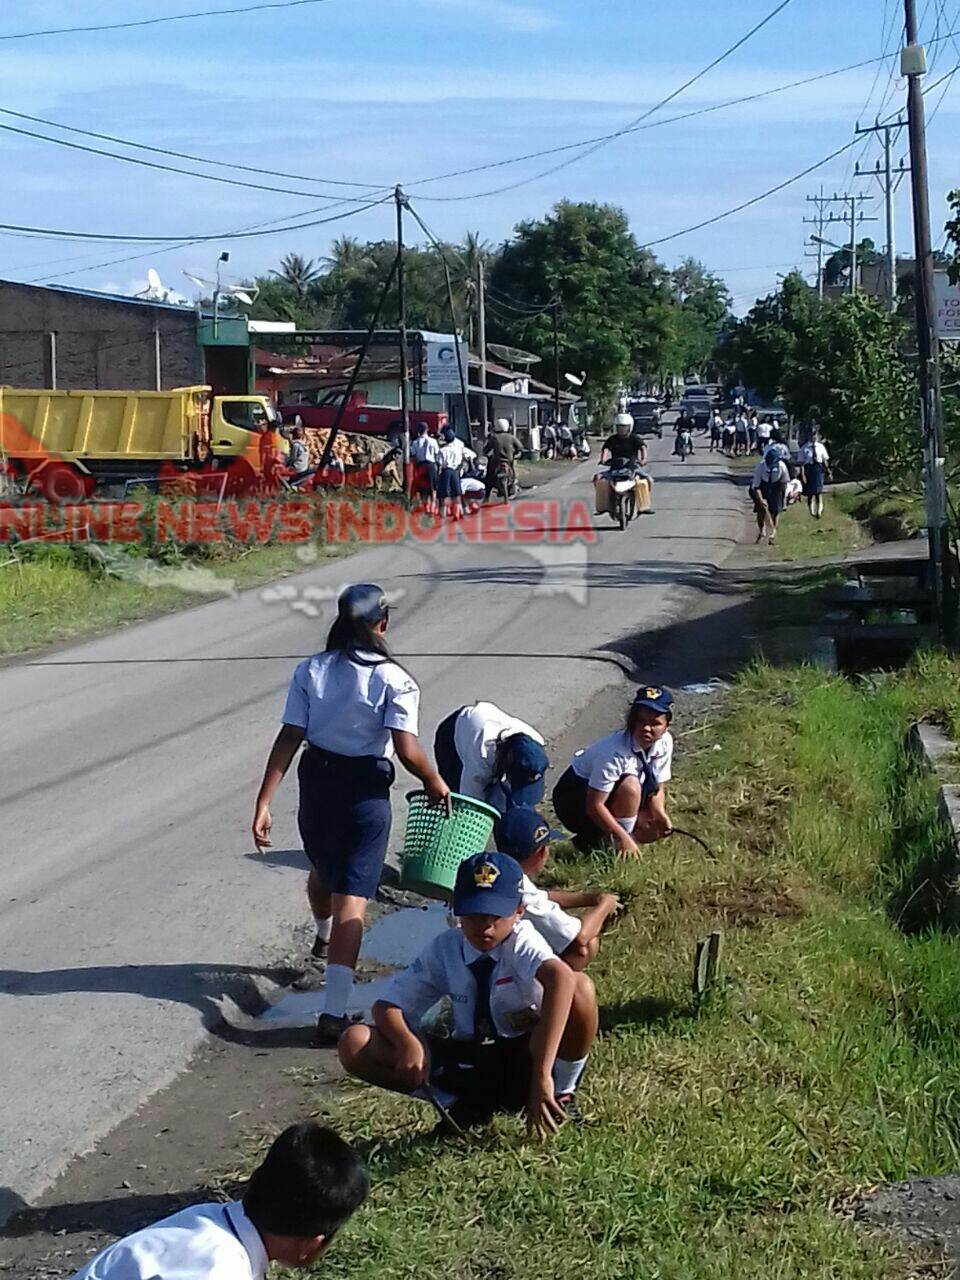 Foto : Siswa/i SMP melaksanakan gotong royong sepanjang jalan protokol Ring road Simanindo, menyambut kedatangan ibu Negara Iriana Jokowi,